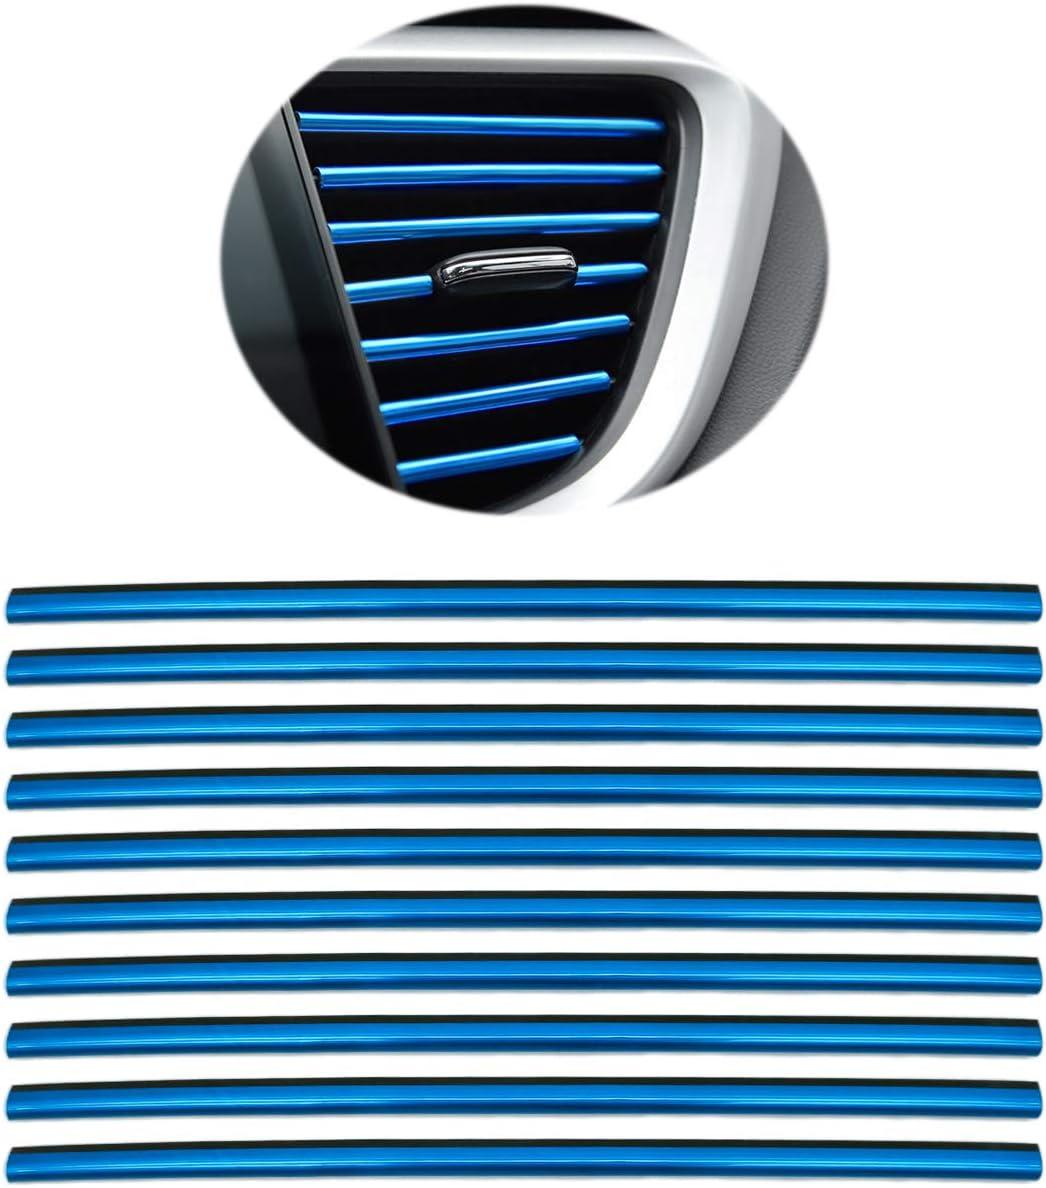 Azul 10 piezas Auto L/üftungsschlitz Auslassleisten Auto Interior Zierleisten Auto L/üftungsgitter Auslass Zierleisten Trim Leiste Innenverkleidung